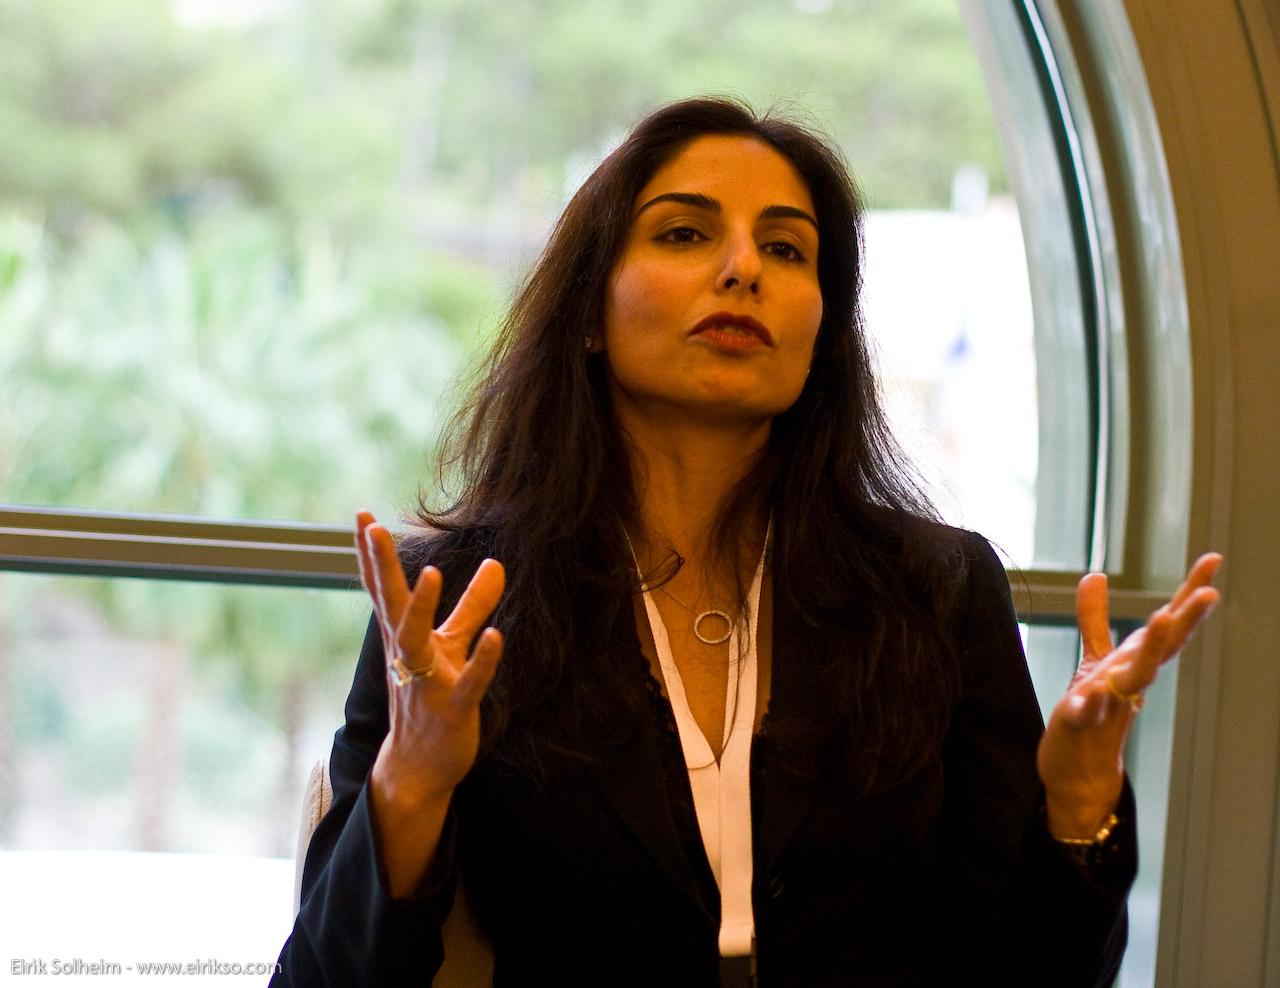 File Amra Tareen IMG 0306 (3029134477).jpg - Wikimedia Commons a6a18d6ac2